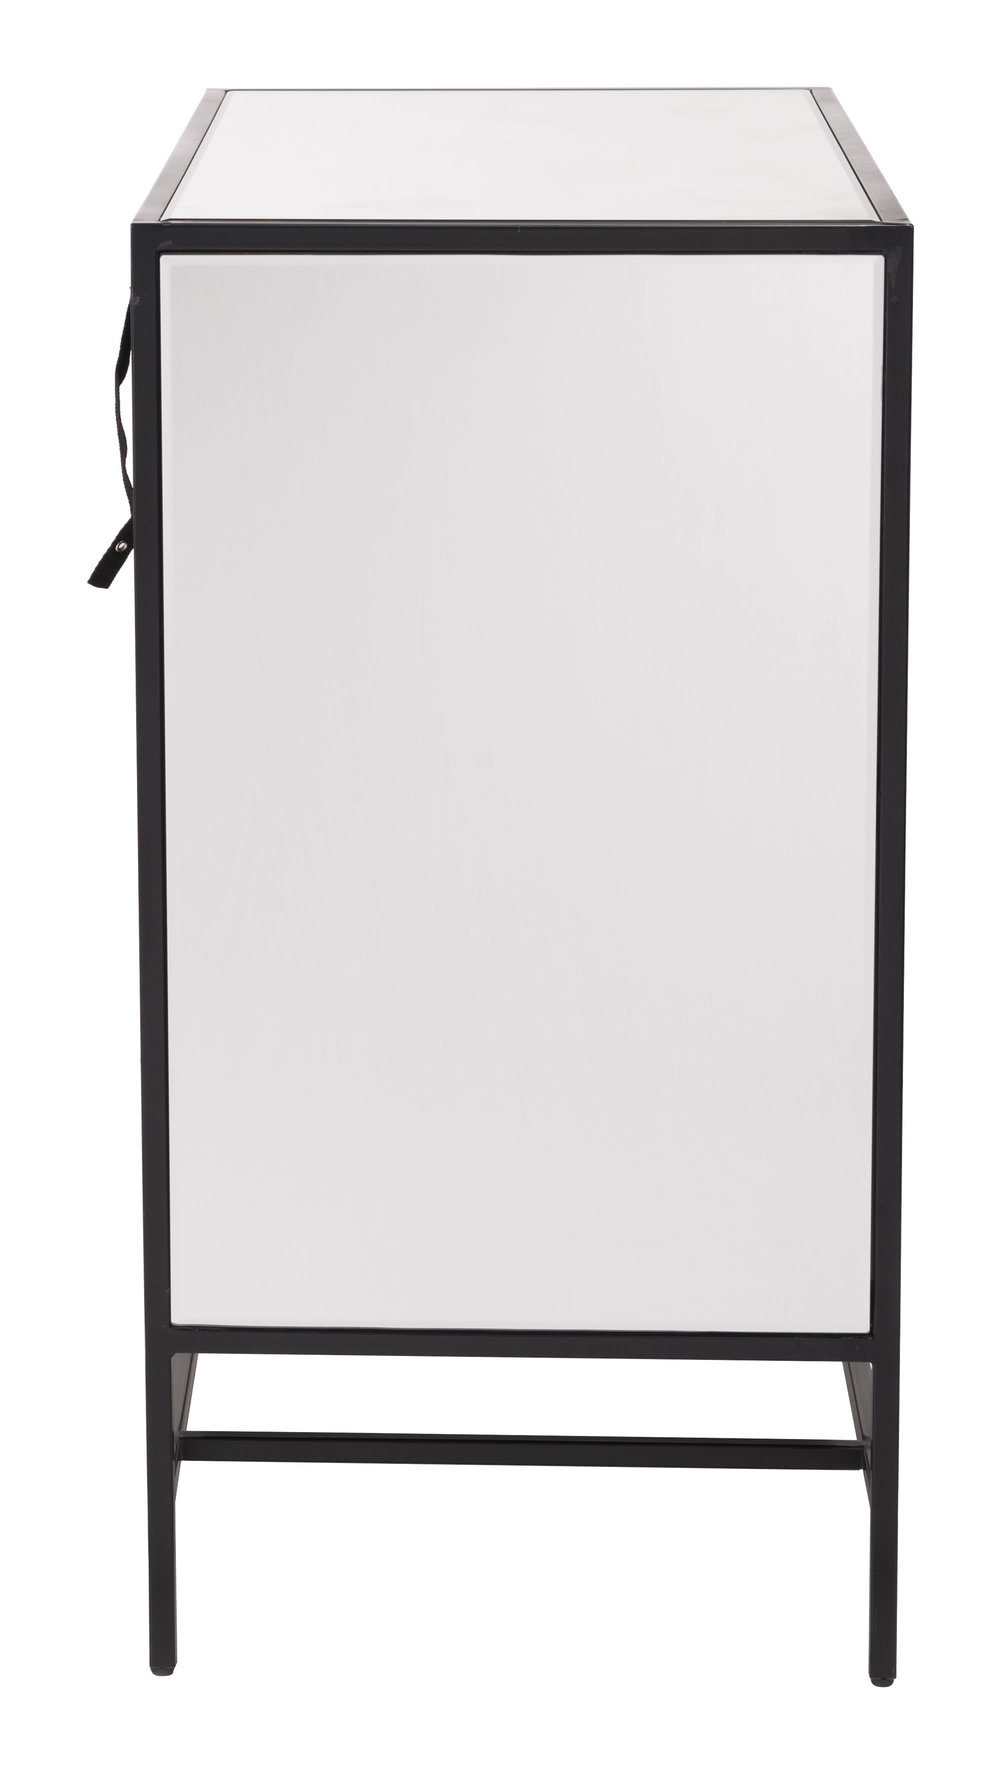 Zuo Modern Contemporary - Upton Cabinet White & Black